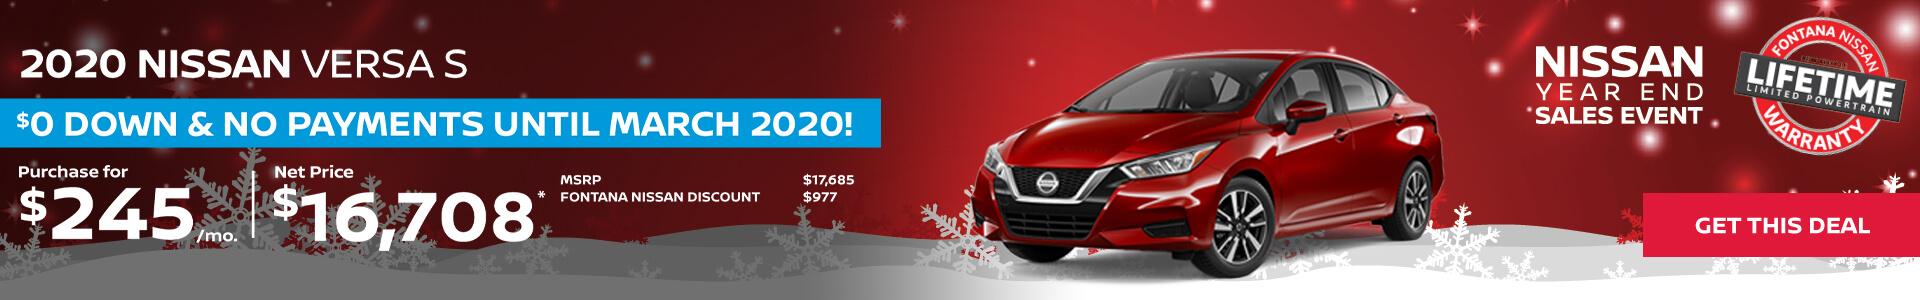 Nissan Versa $245